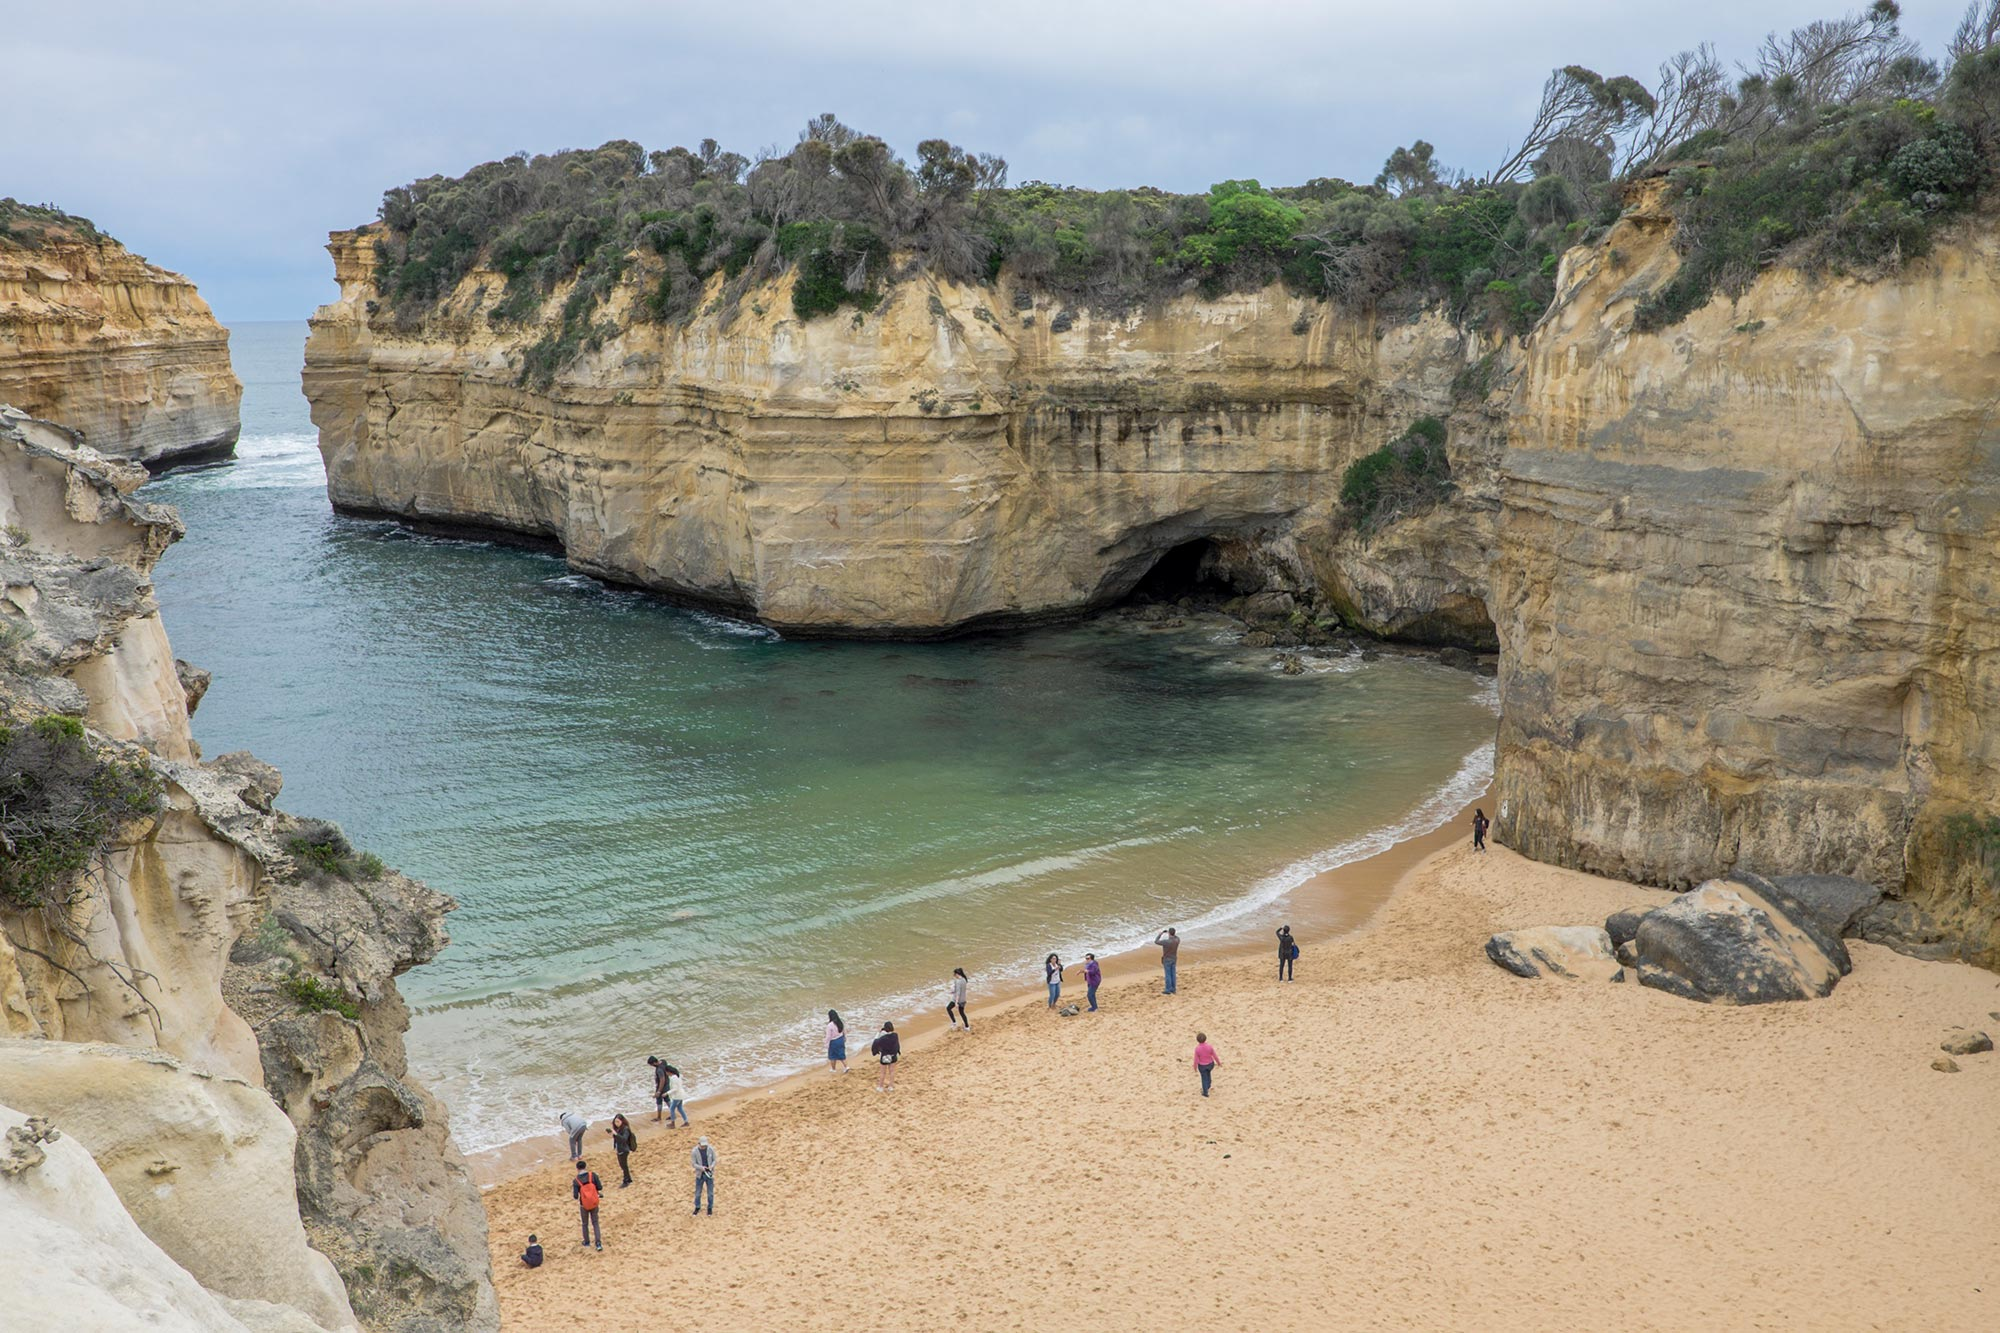 australia-melbourne-great-ocean-road-loch-ard-gorge2